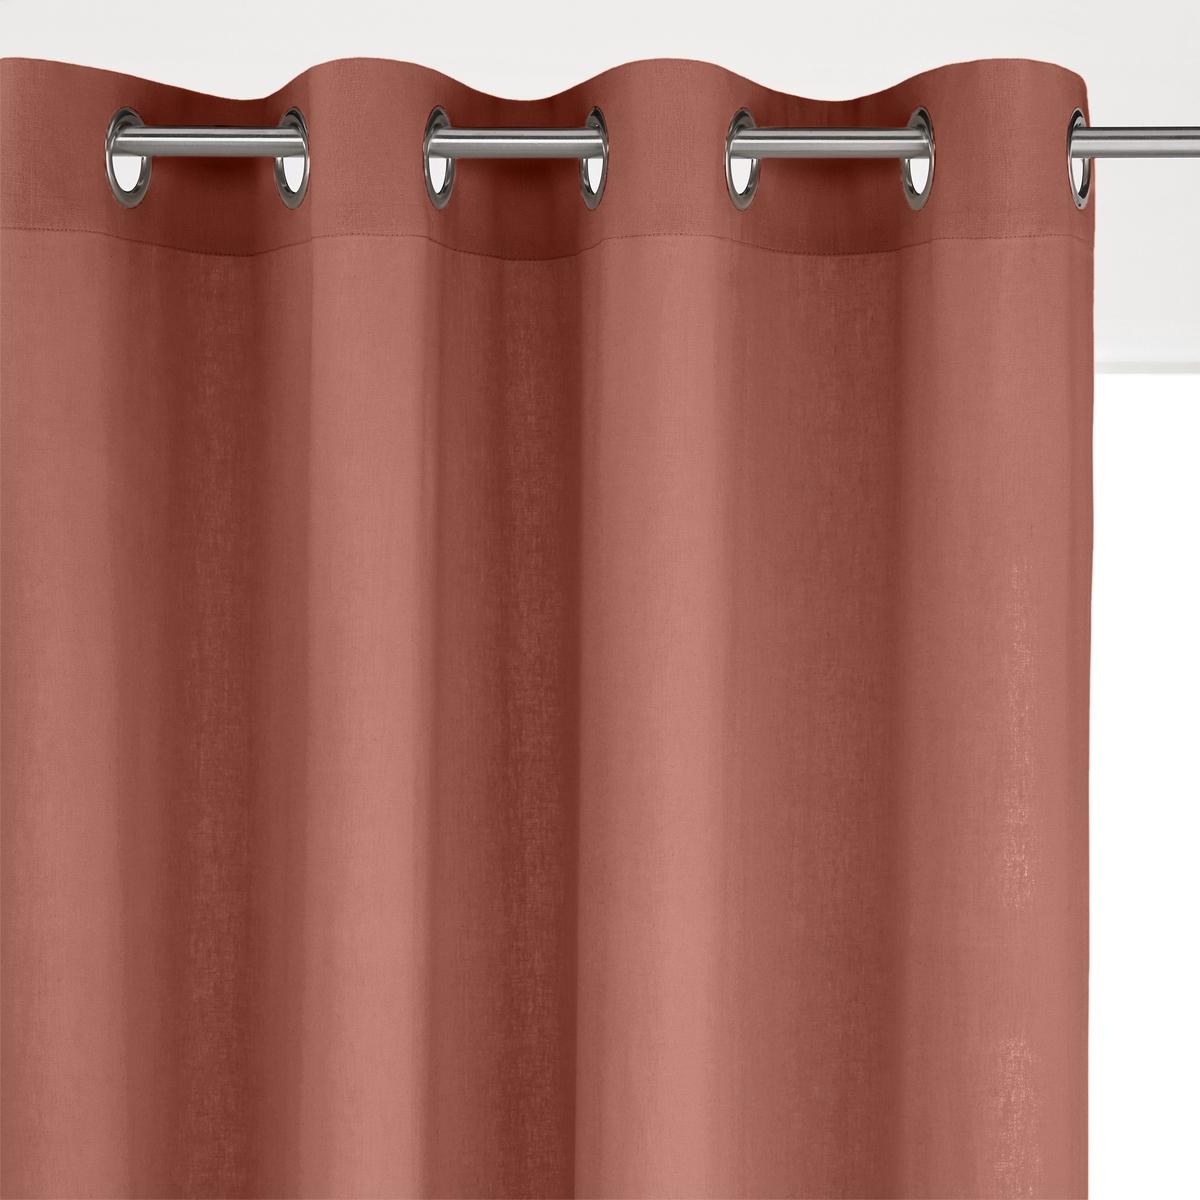 Штора LaRedoute Из льна и вискозы с люверсами Odorie 250 x 135 см каштановый